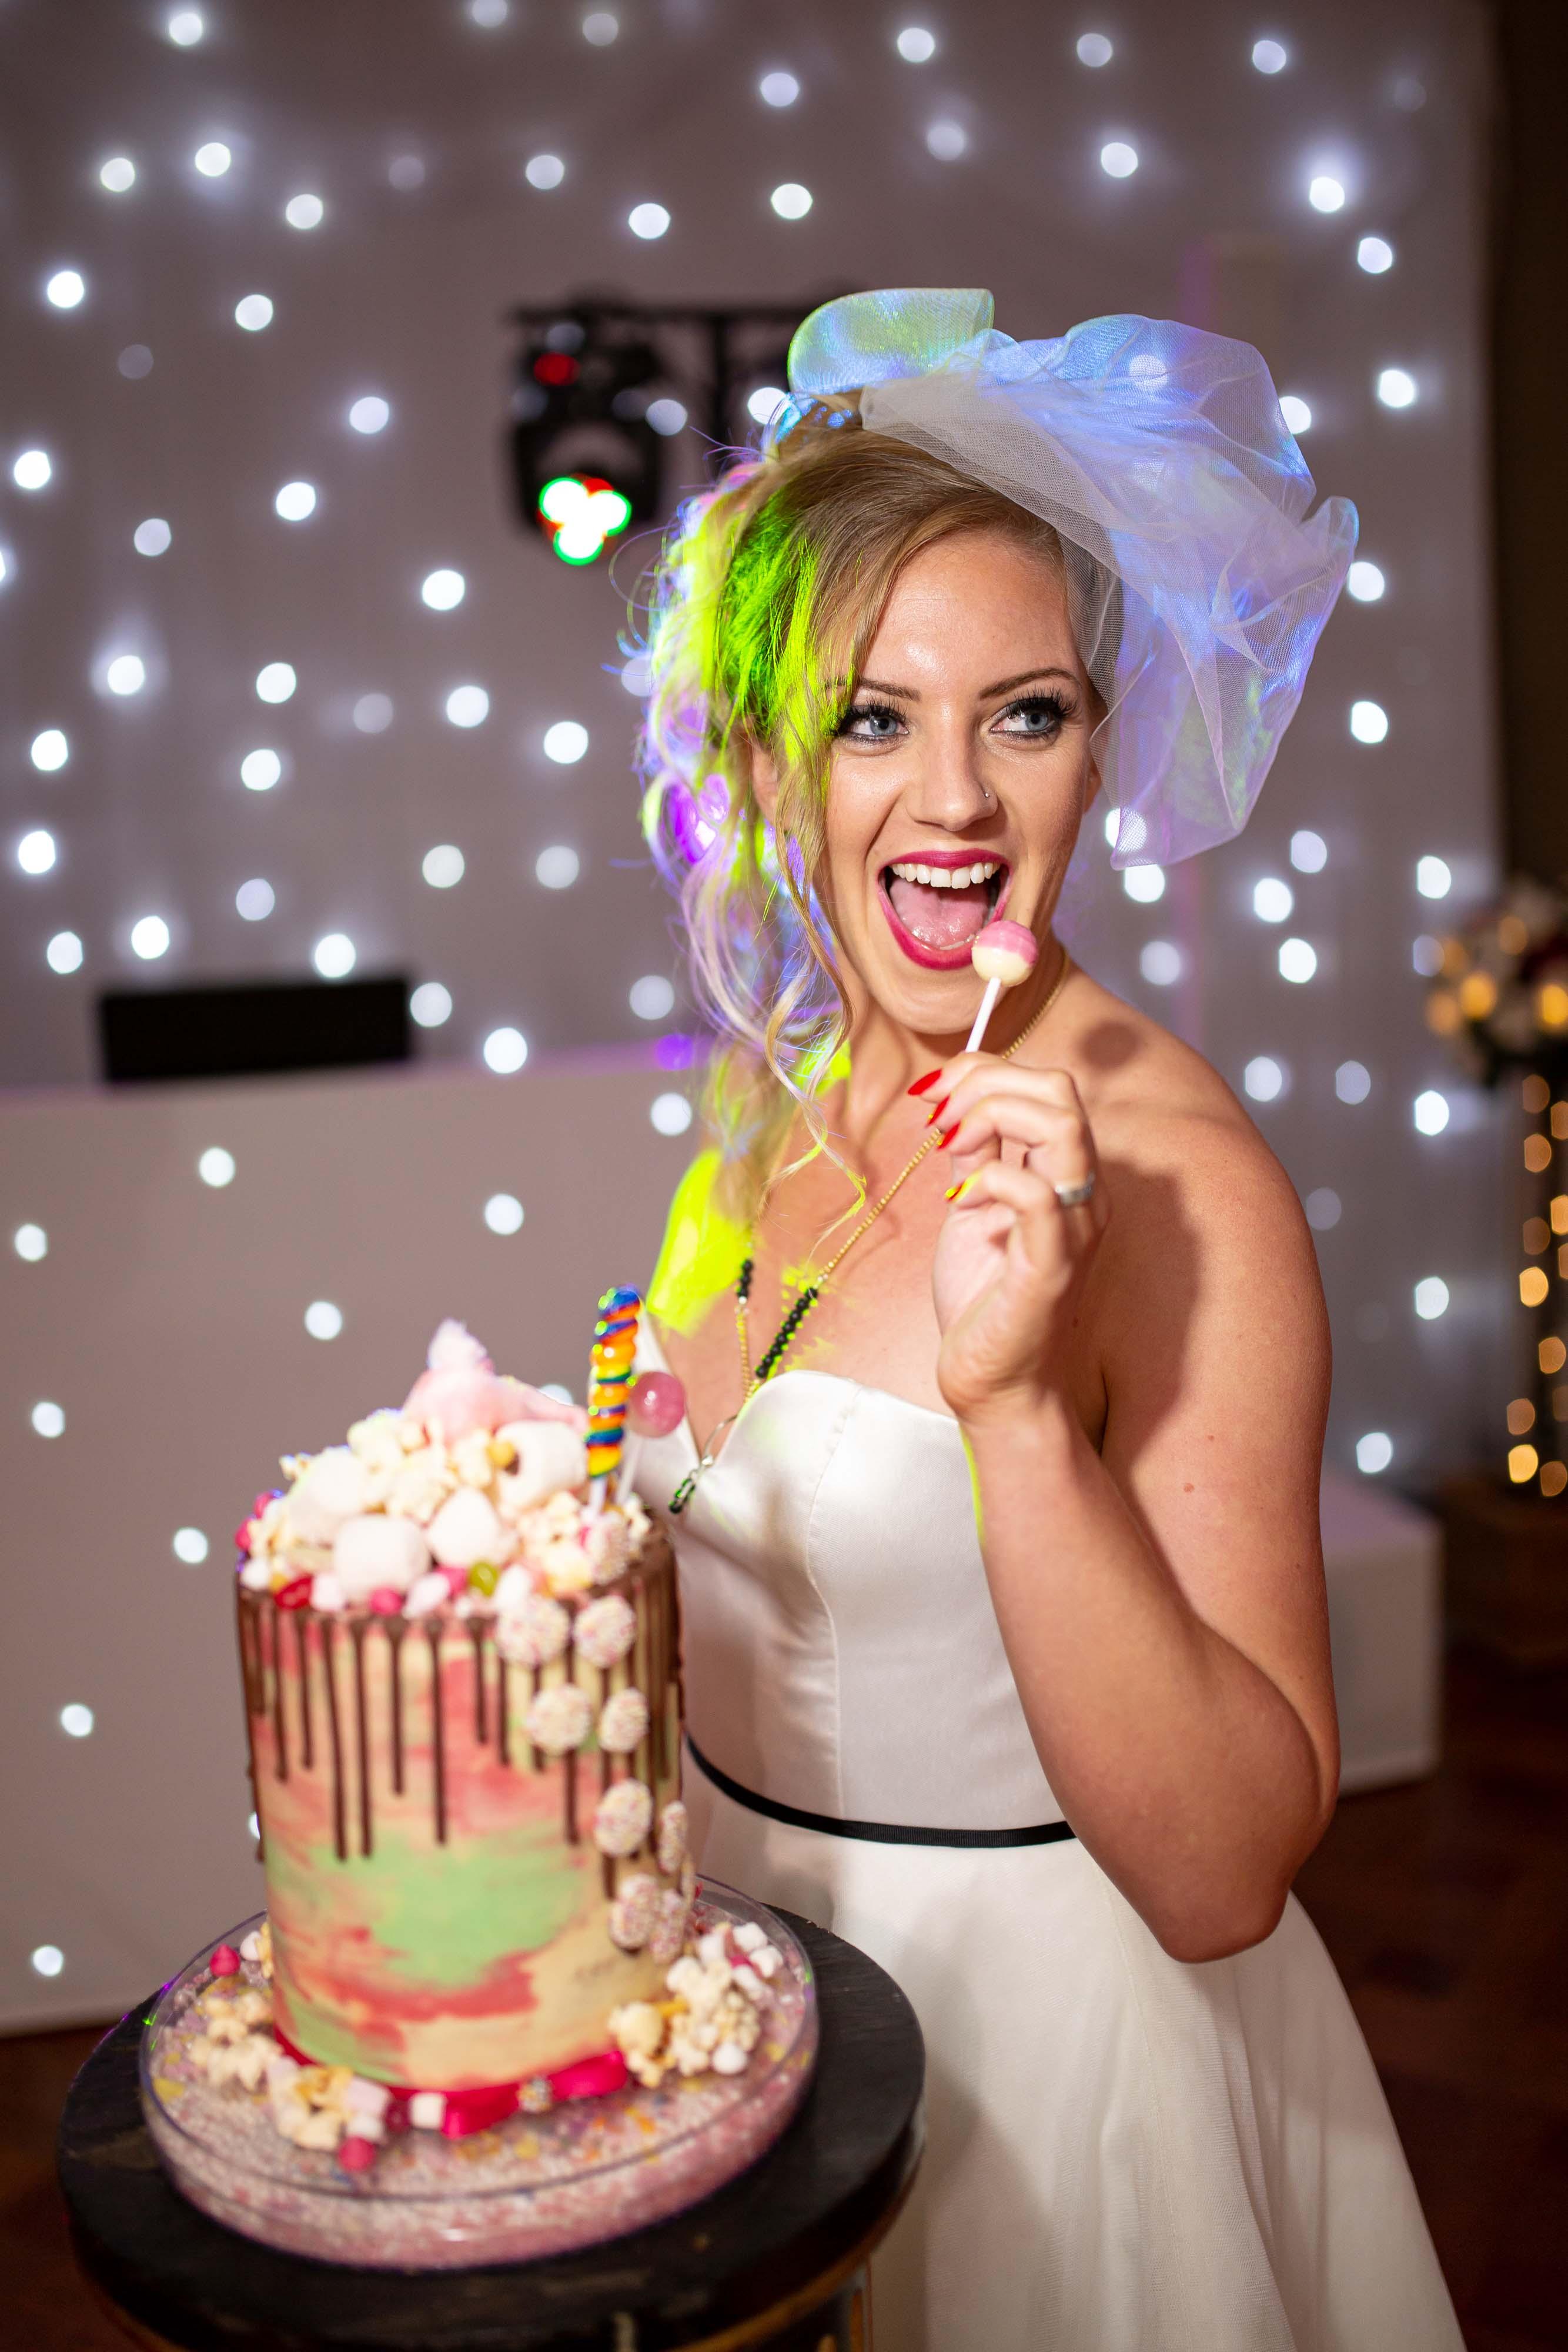 iconic wedding looks- music themed wedding- unconventional wedding- alternative wedding- madonna wedding dress- madonna wedding- sweetie wedding cake- fun wedding